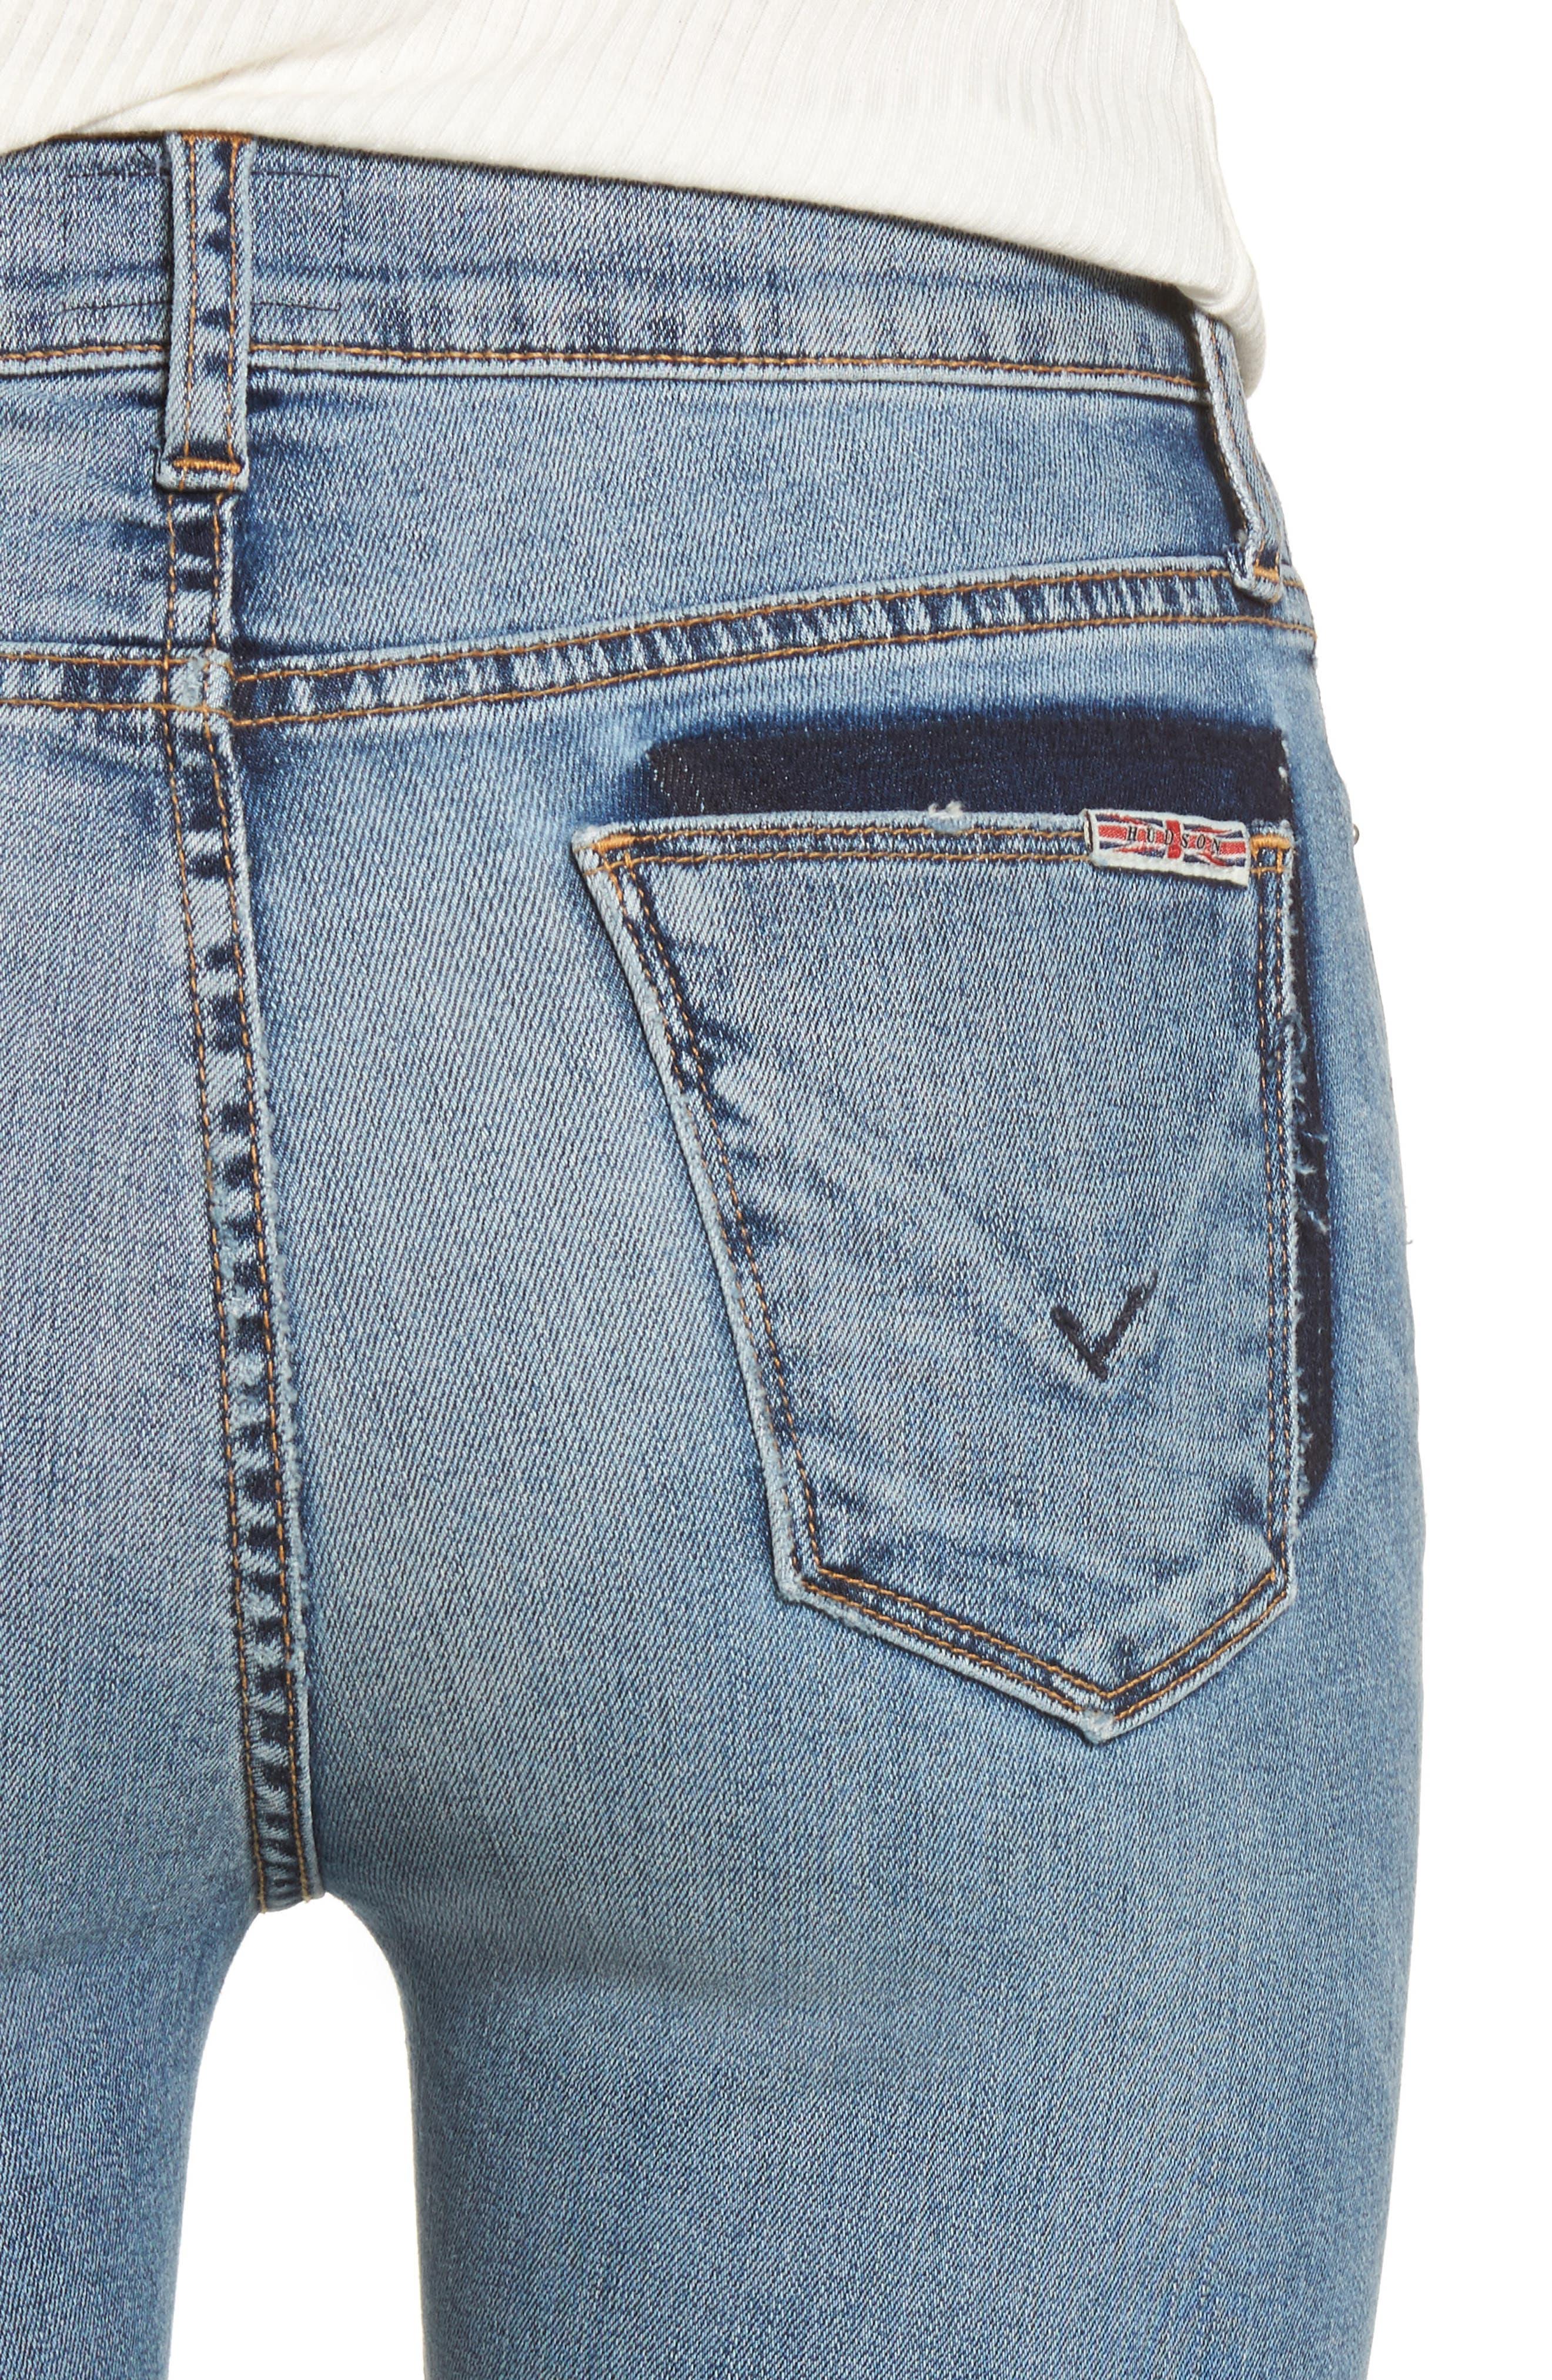 Alternate Image 4  - Hudson Jeans Barbara High Waist Ankle Skinny Jeans (Confection)